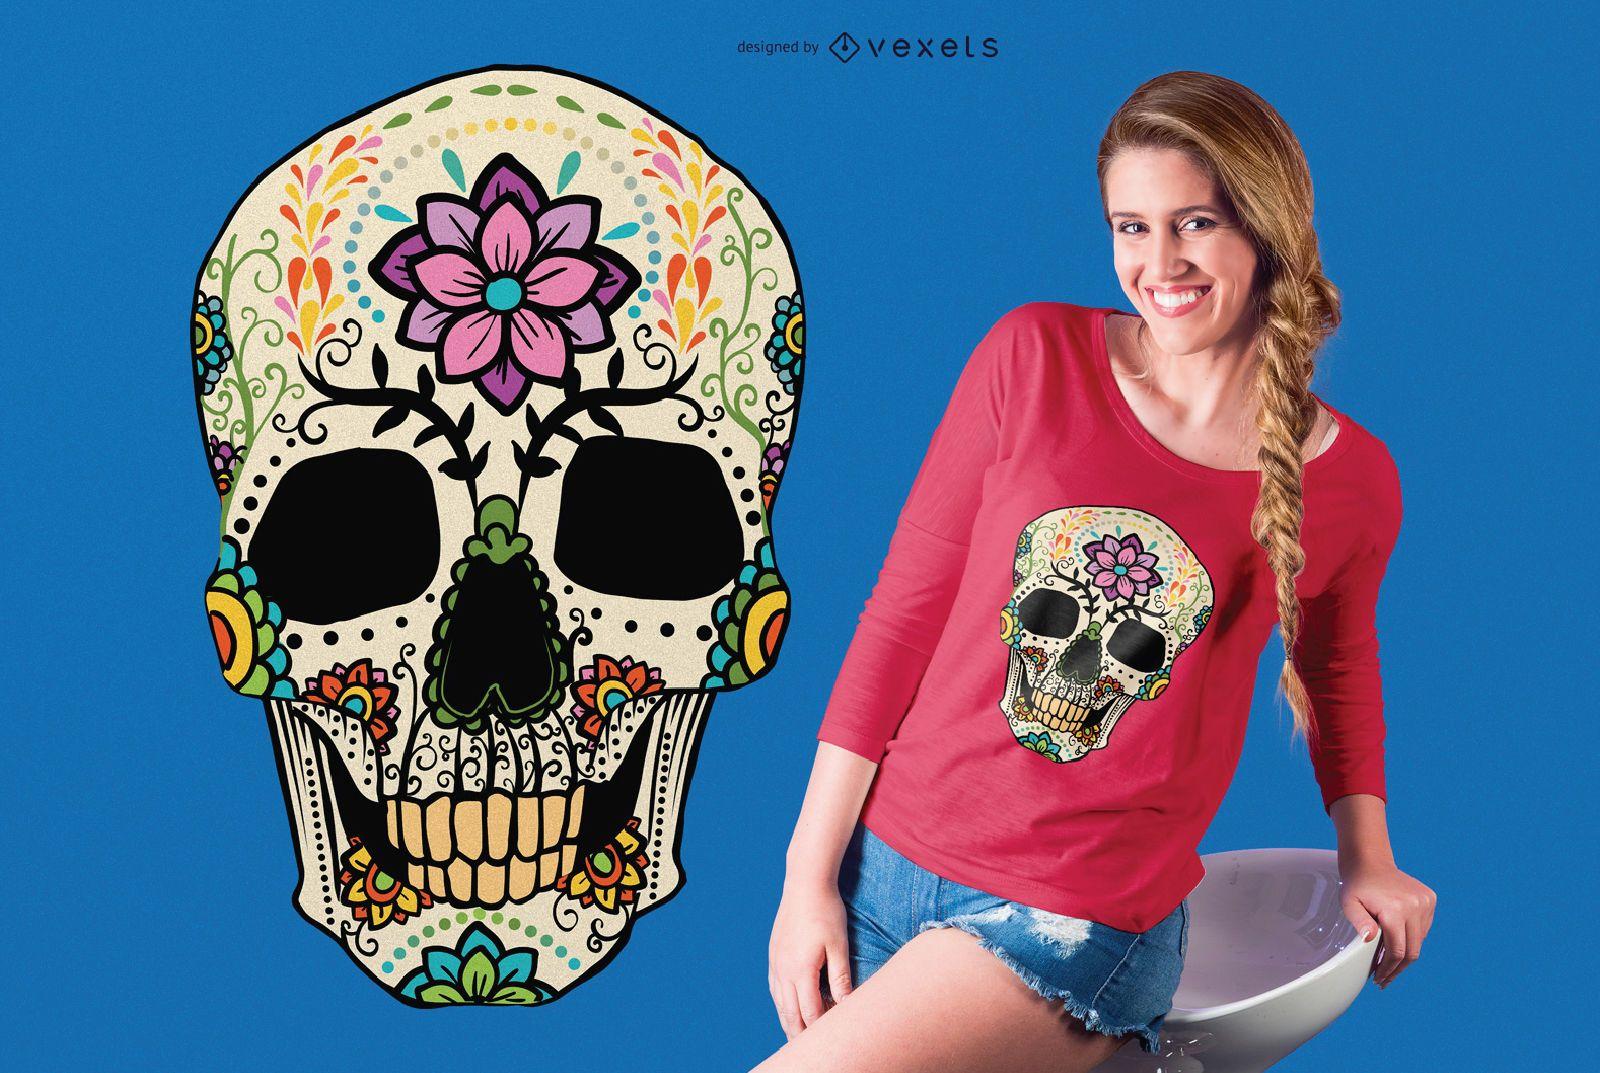 Sugar Skull with Flowers T-shirt Design